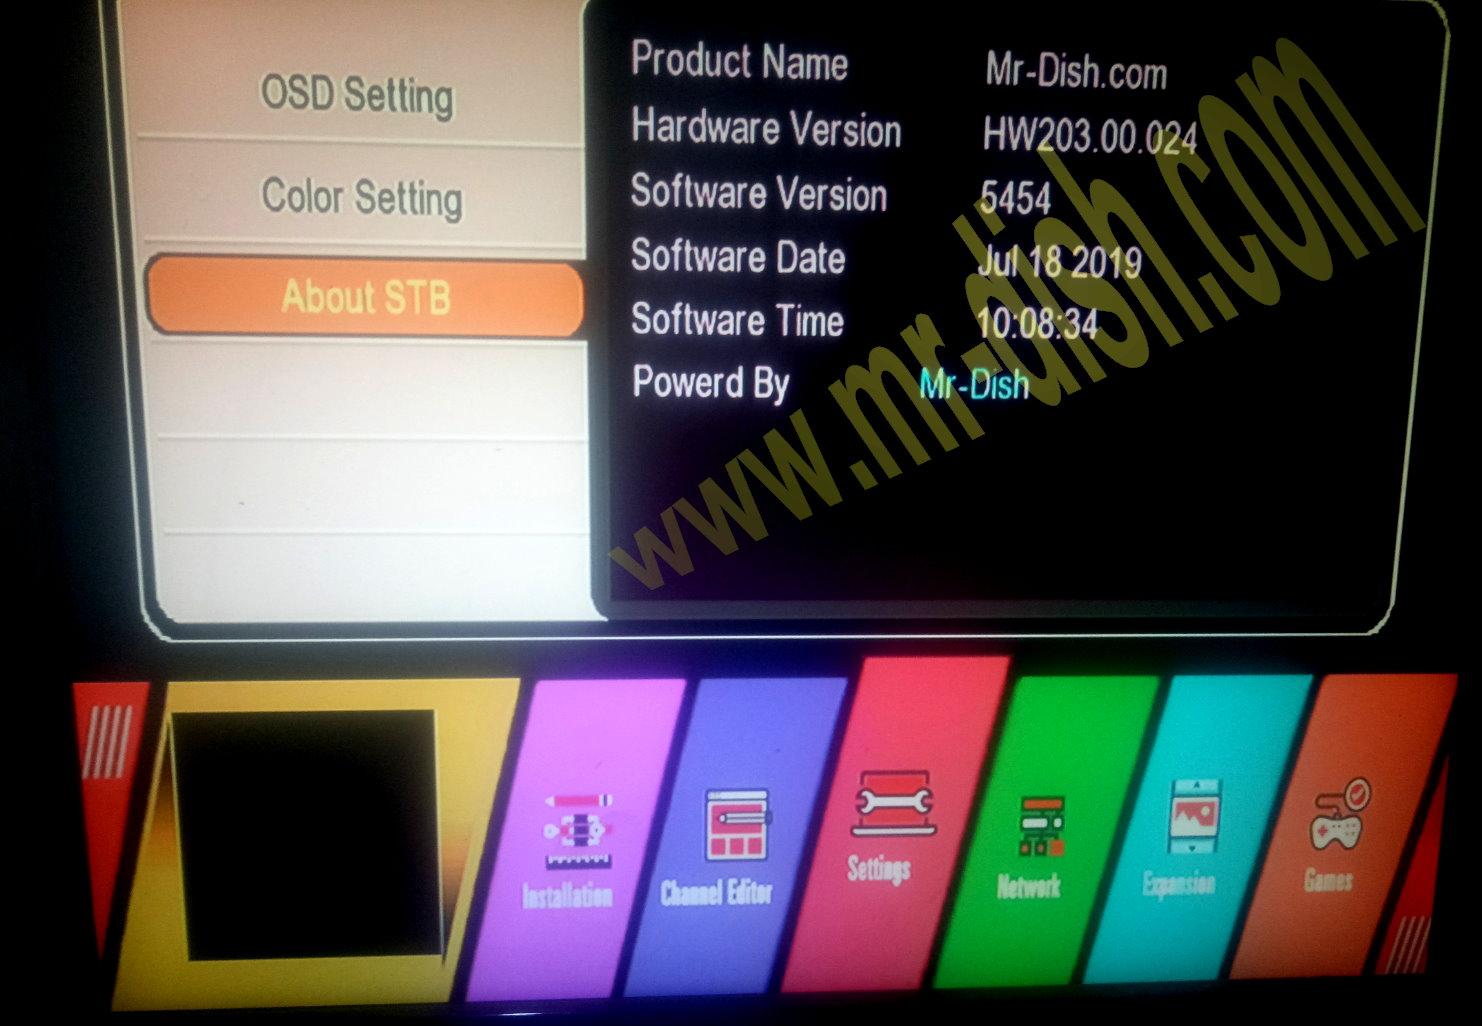 GX6605S HW203 00 024 CCCAM & TEN SPORT OK SOFTWARE - Mr-Dish